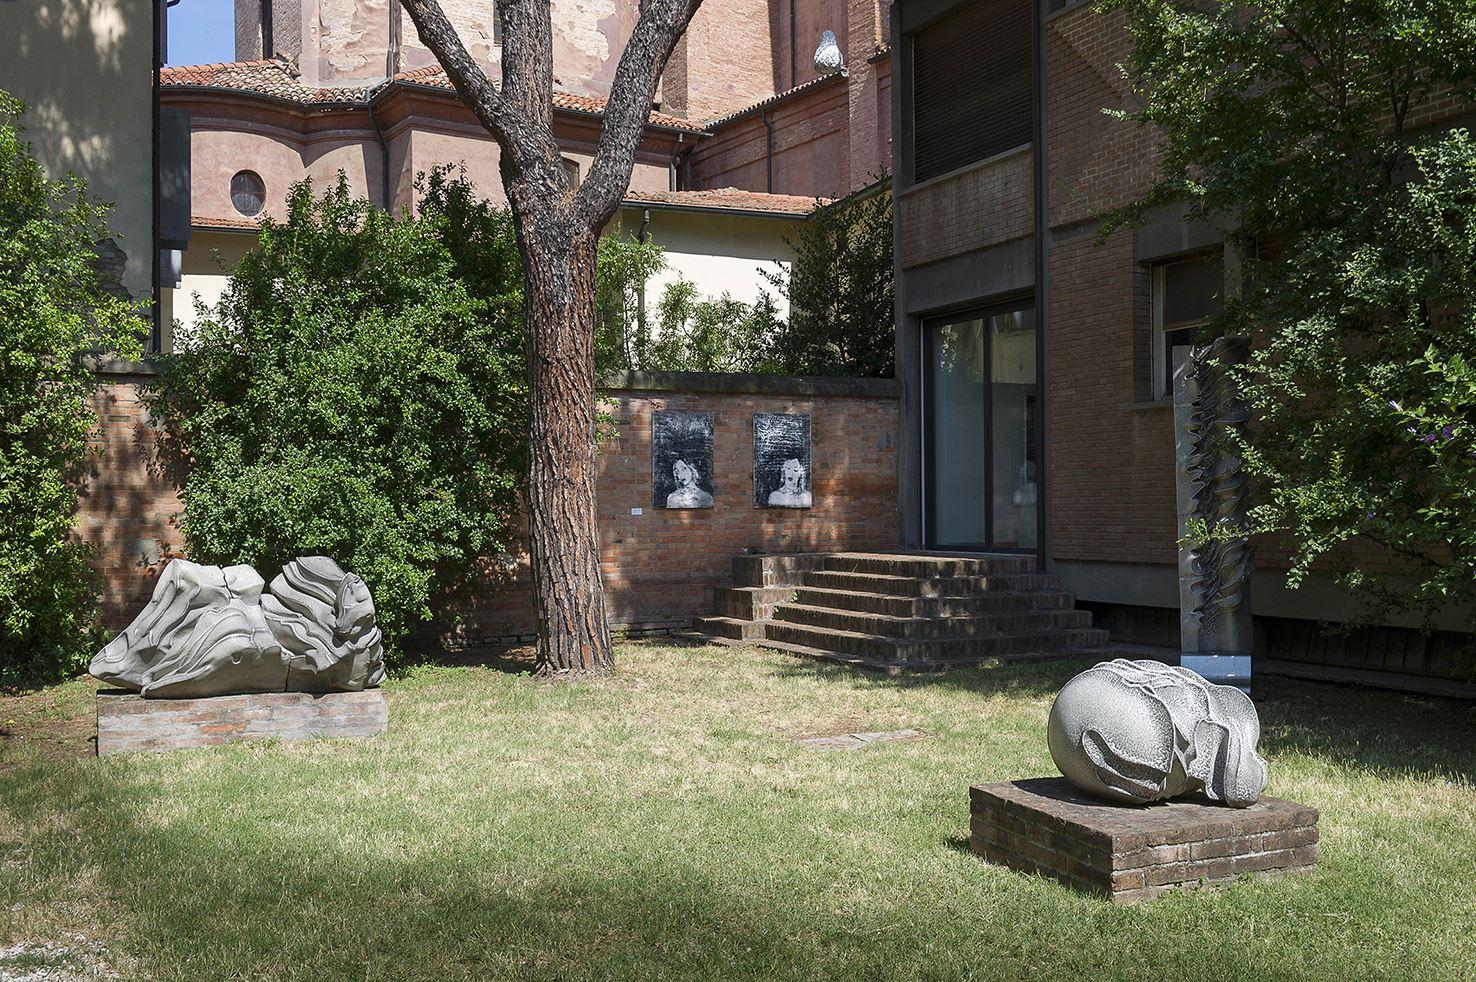 Carlo Zauli Museum